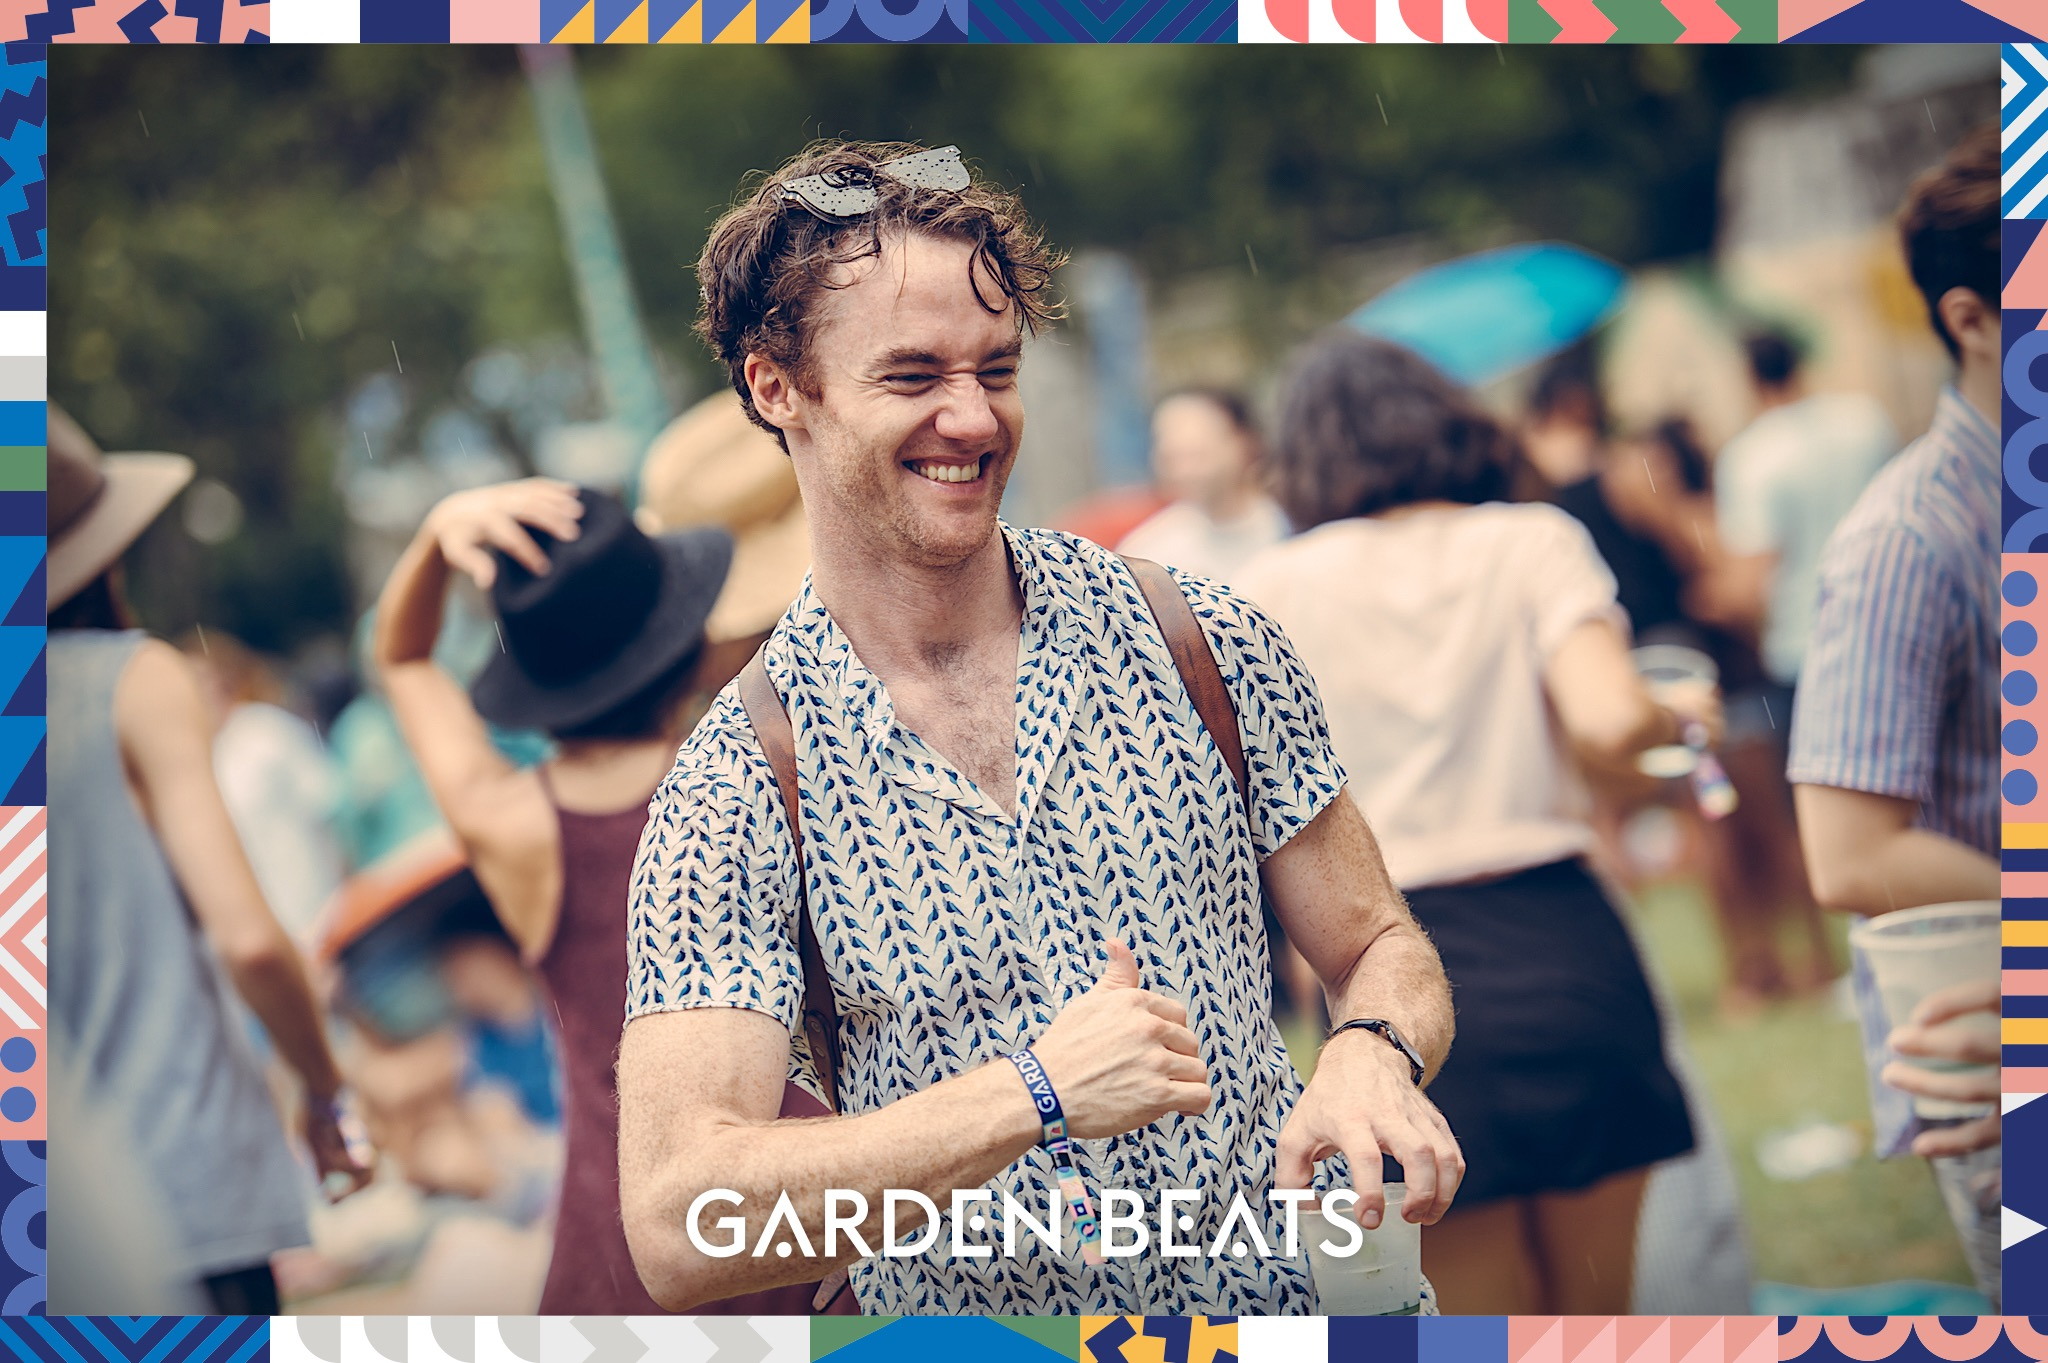 03032018_GardenBeats_Colossal545_Watermarked.jpg